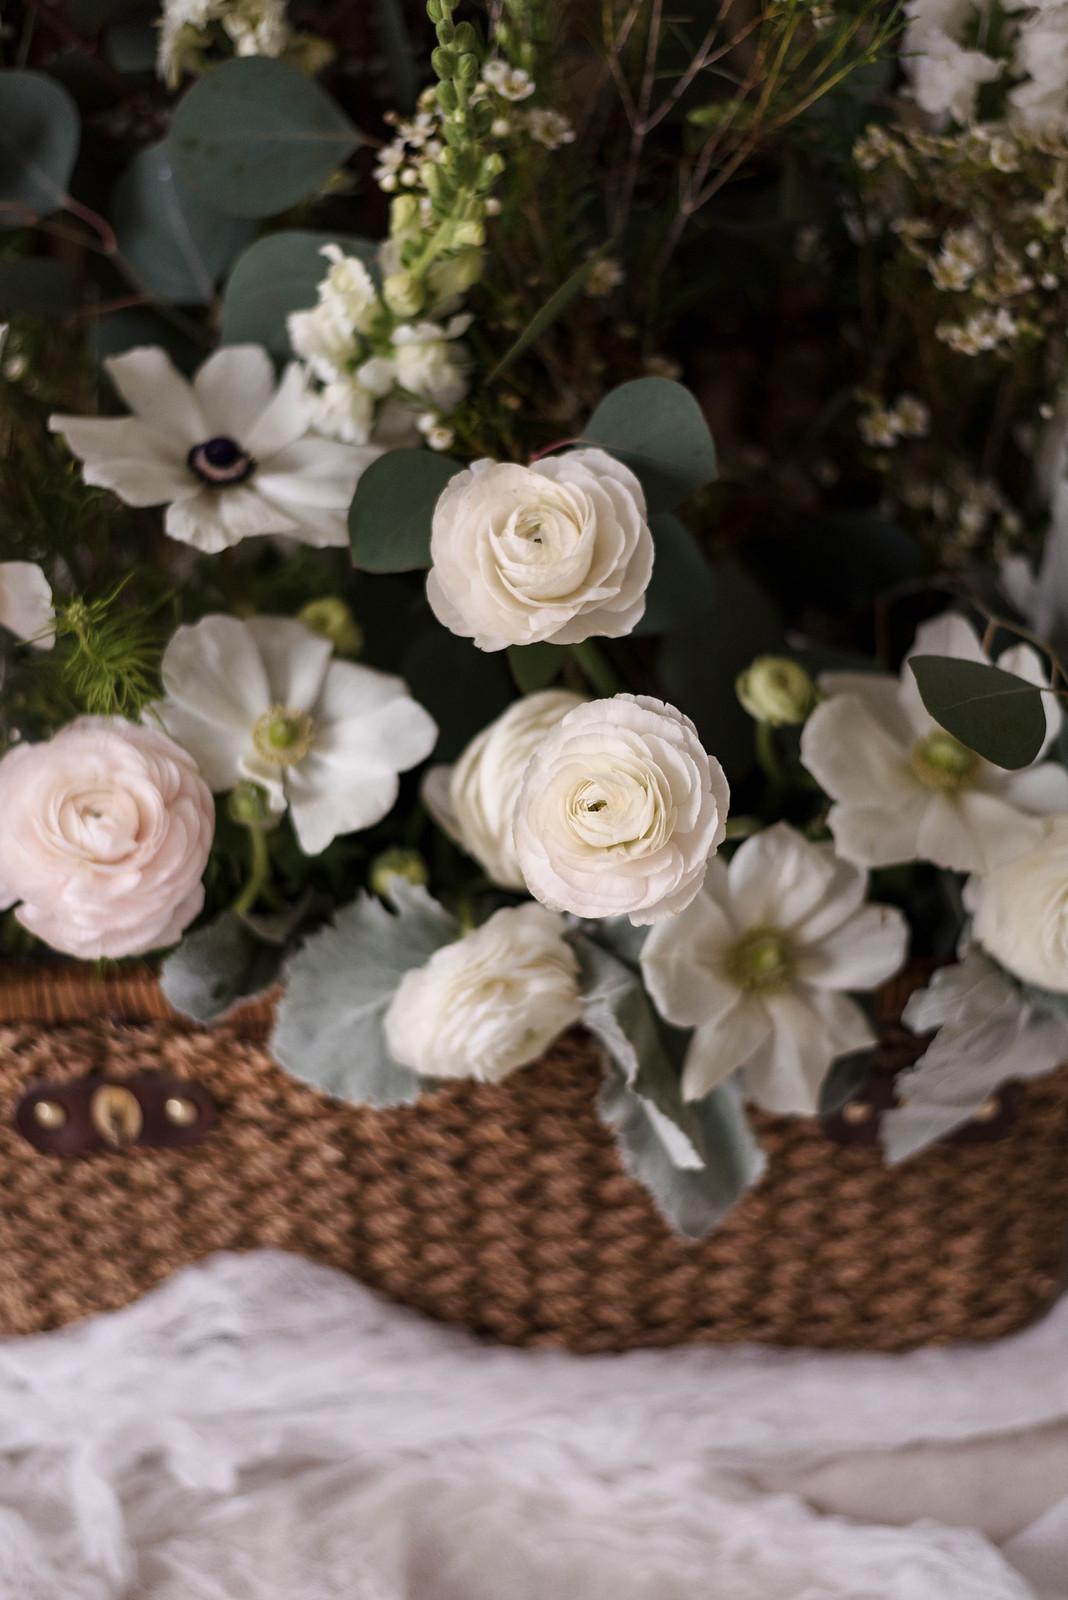 Picnic Basket Floral Design on http://juliettelaura.blogspot.com/